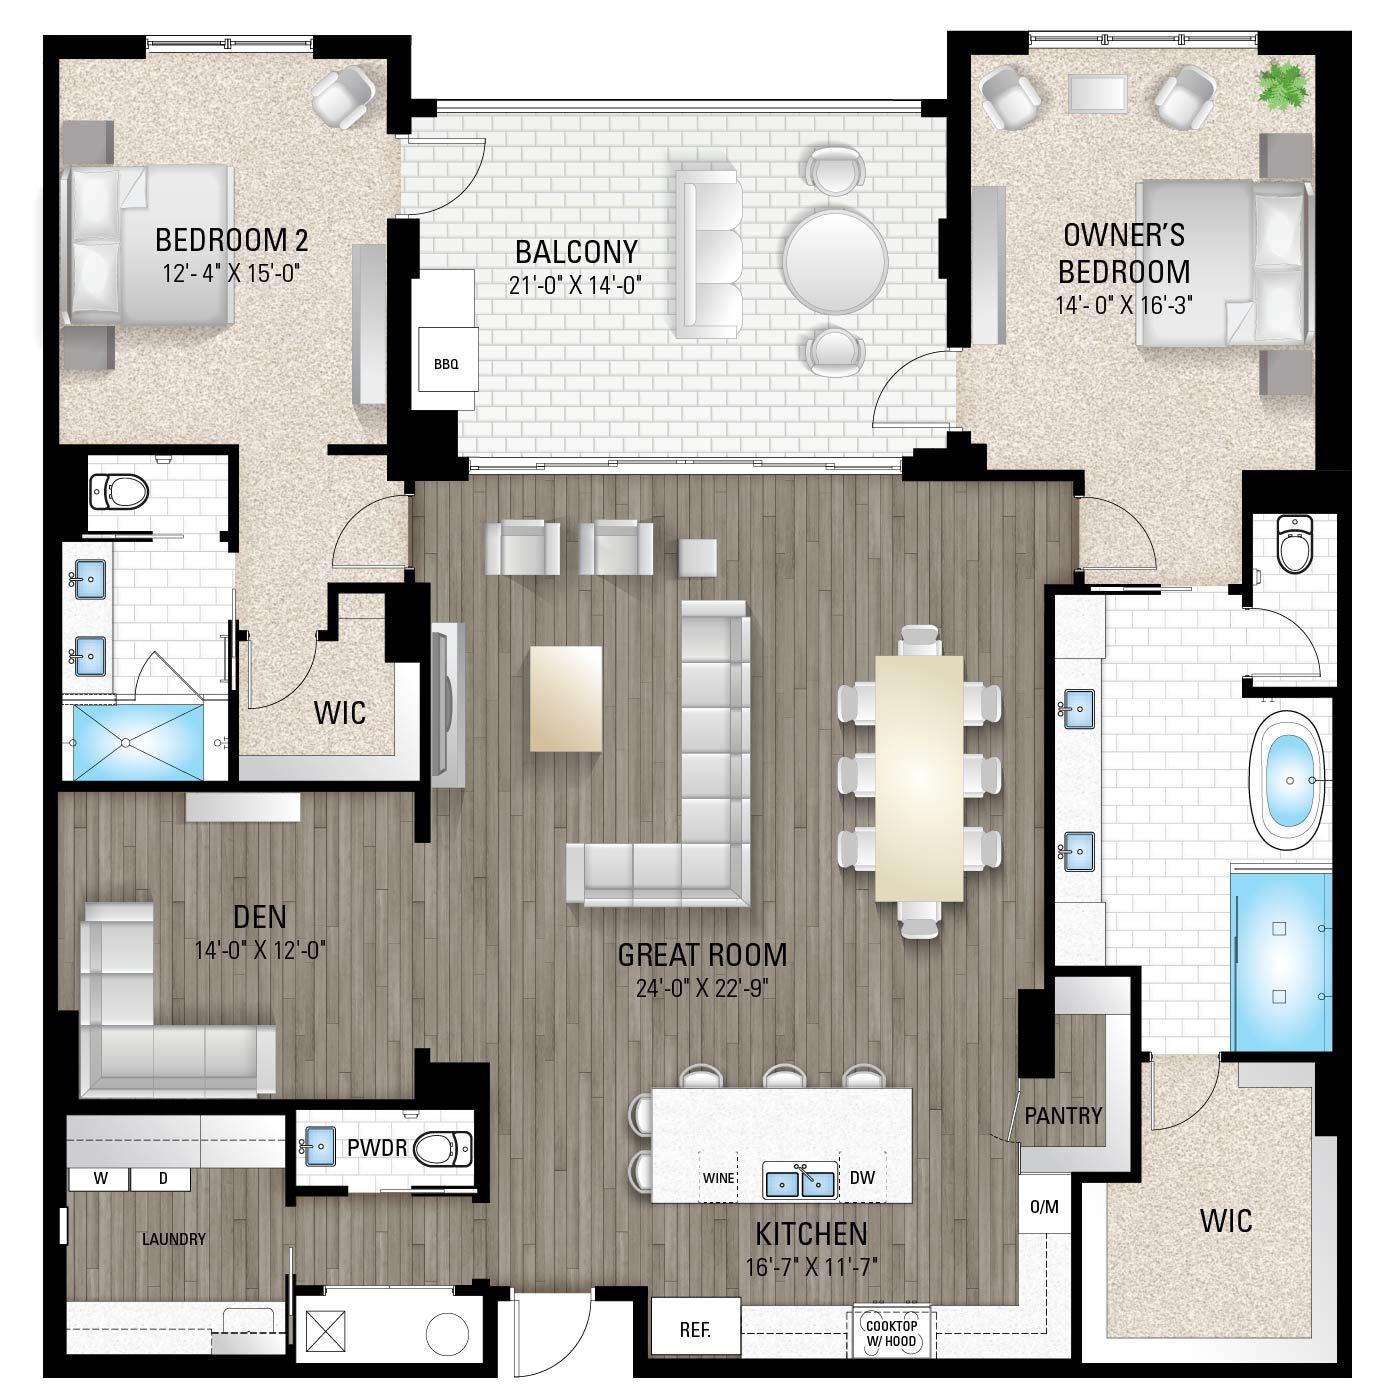 Captiva 2:2 Bedrooms / 2.5 Baths / Den